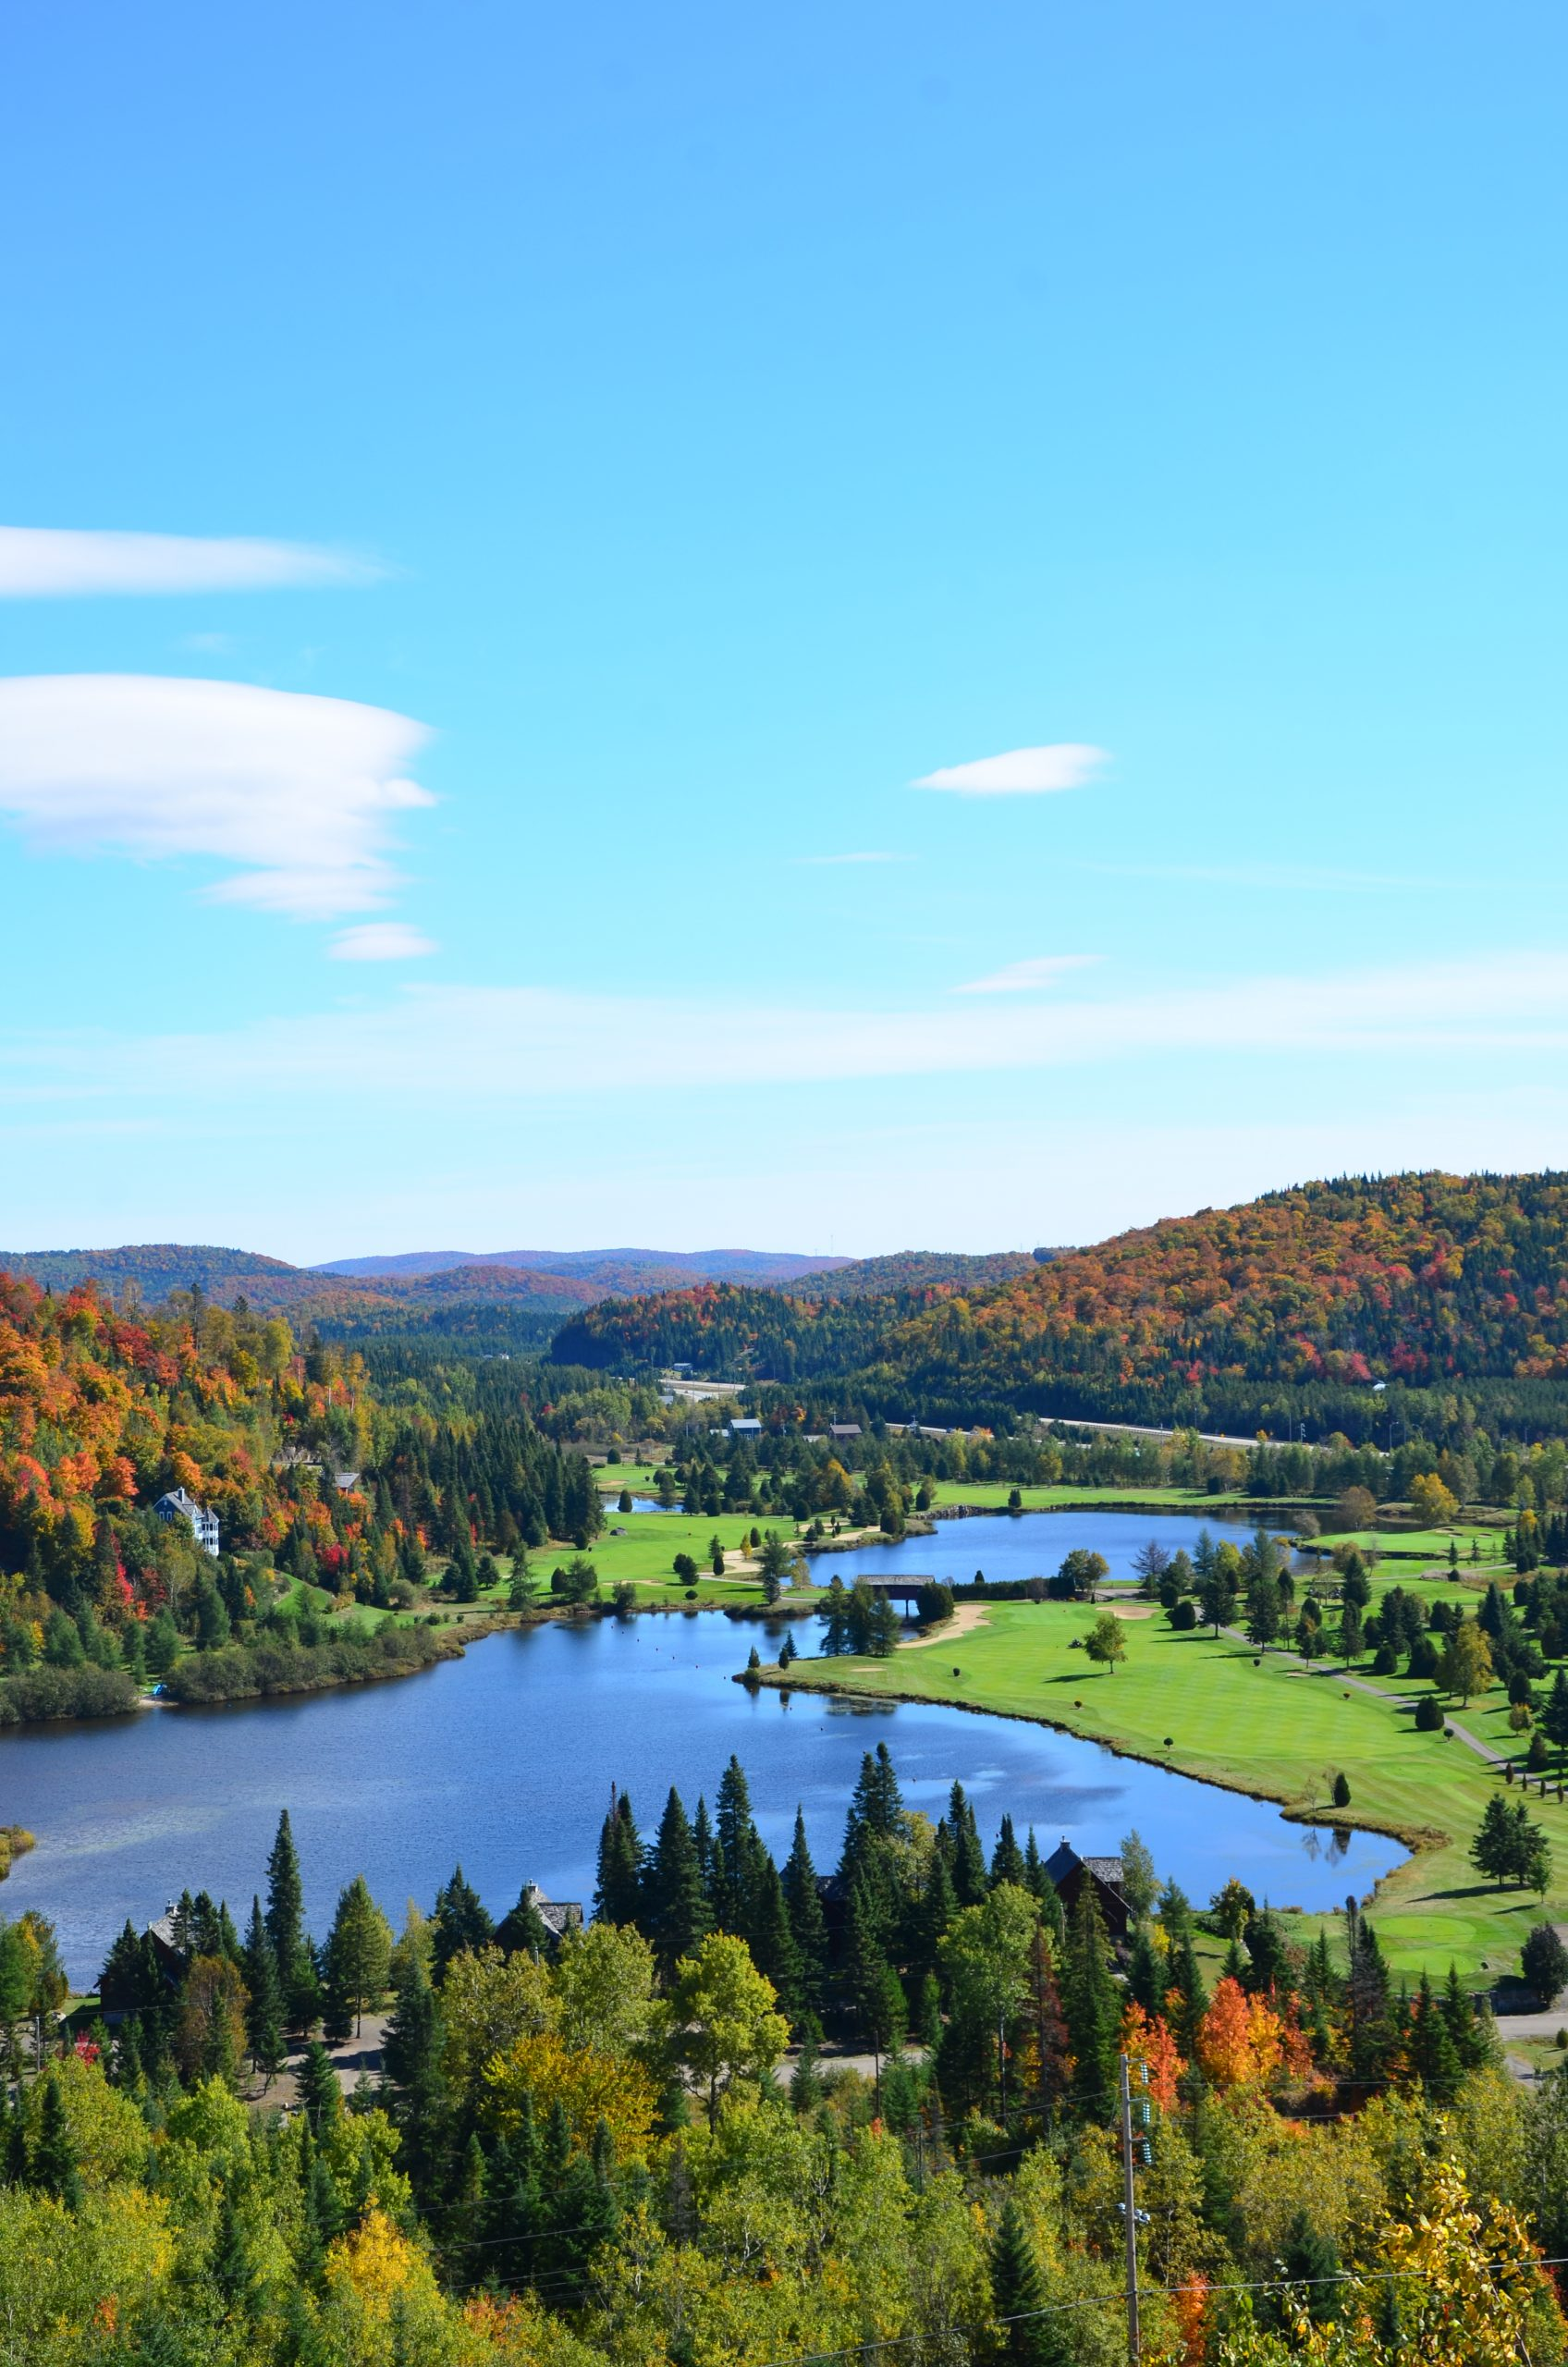 Golf Automne vue aerienne Royal Laurentien